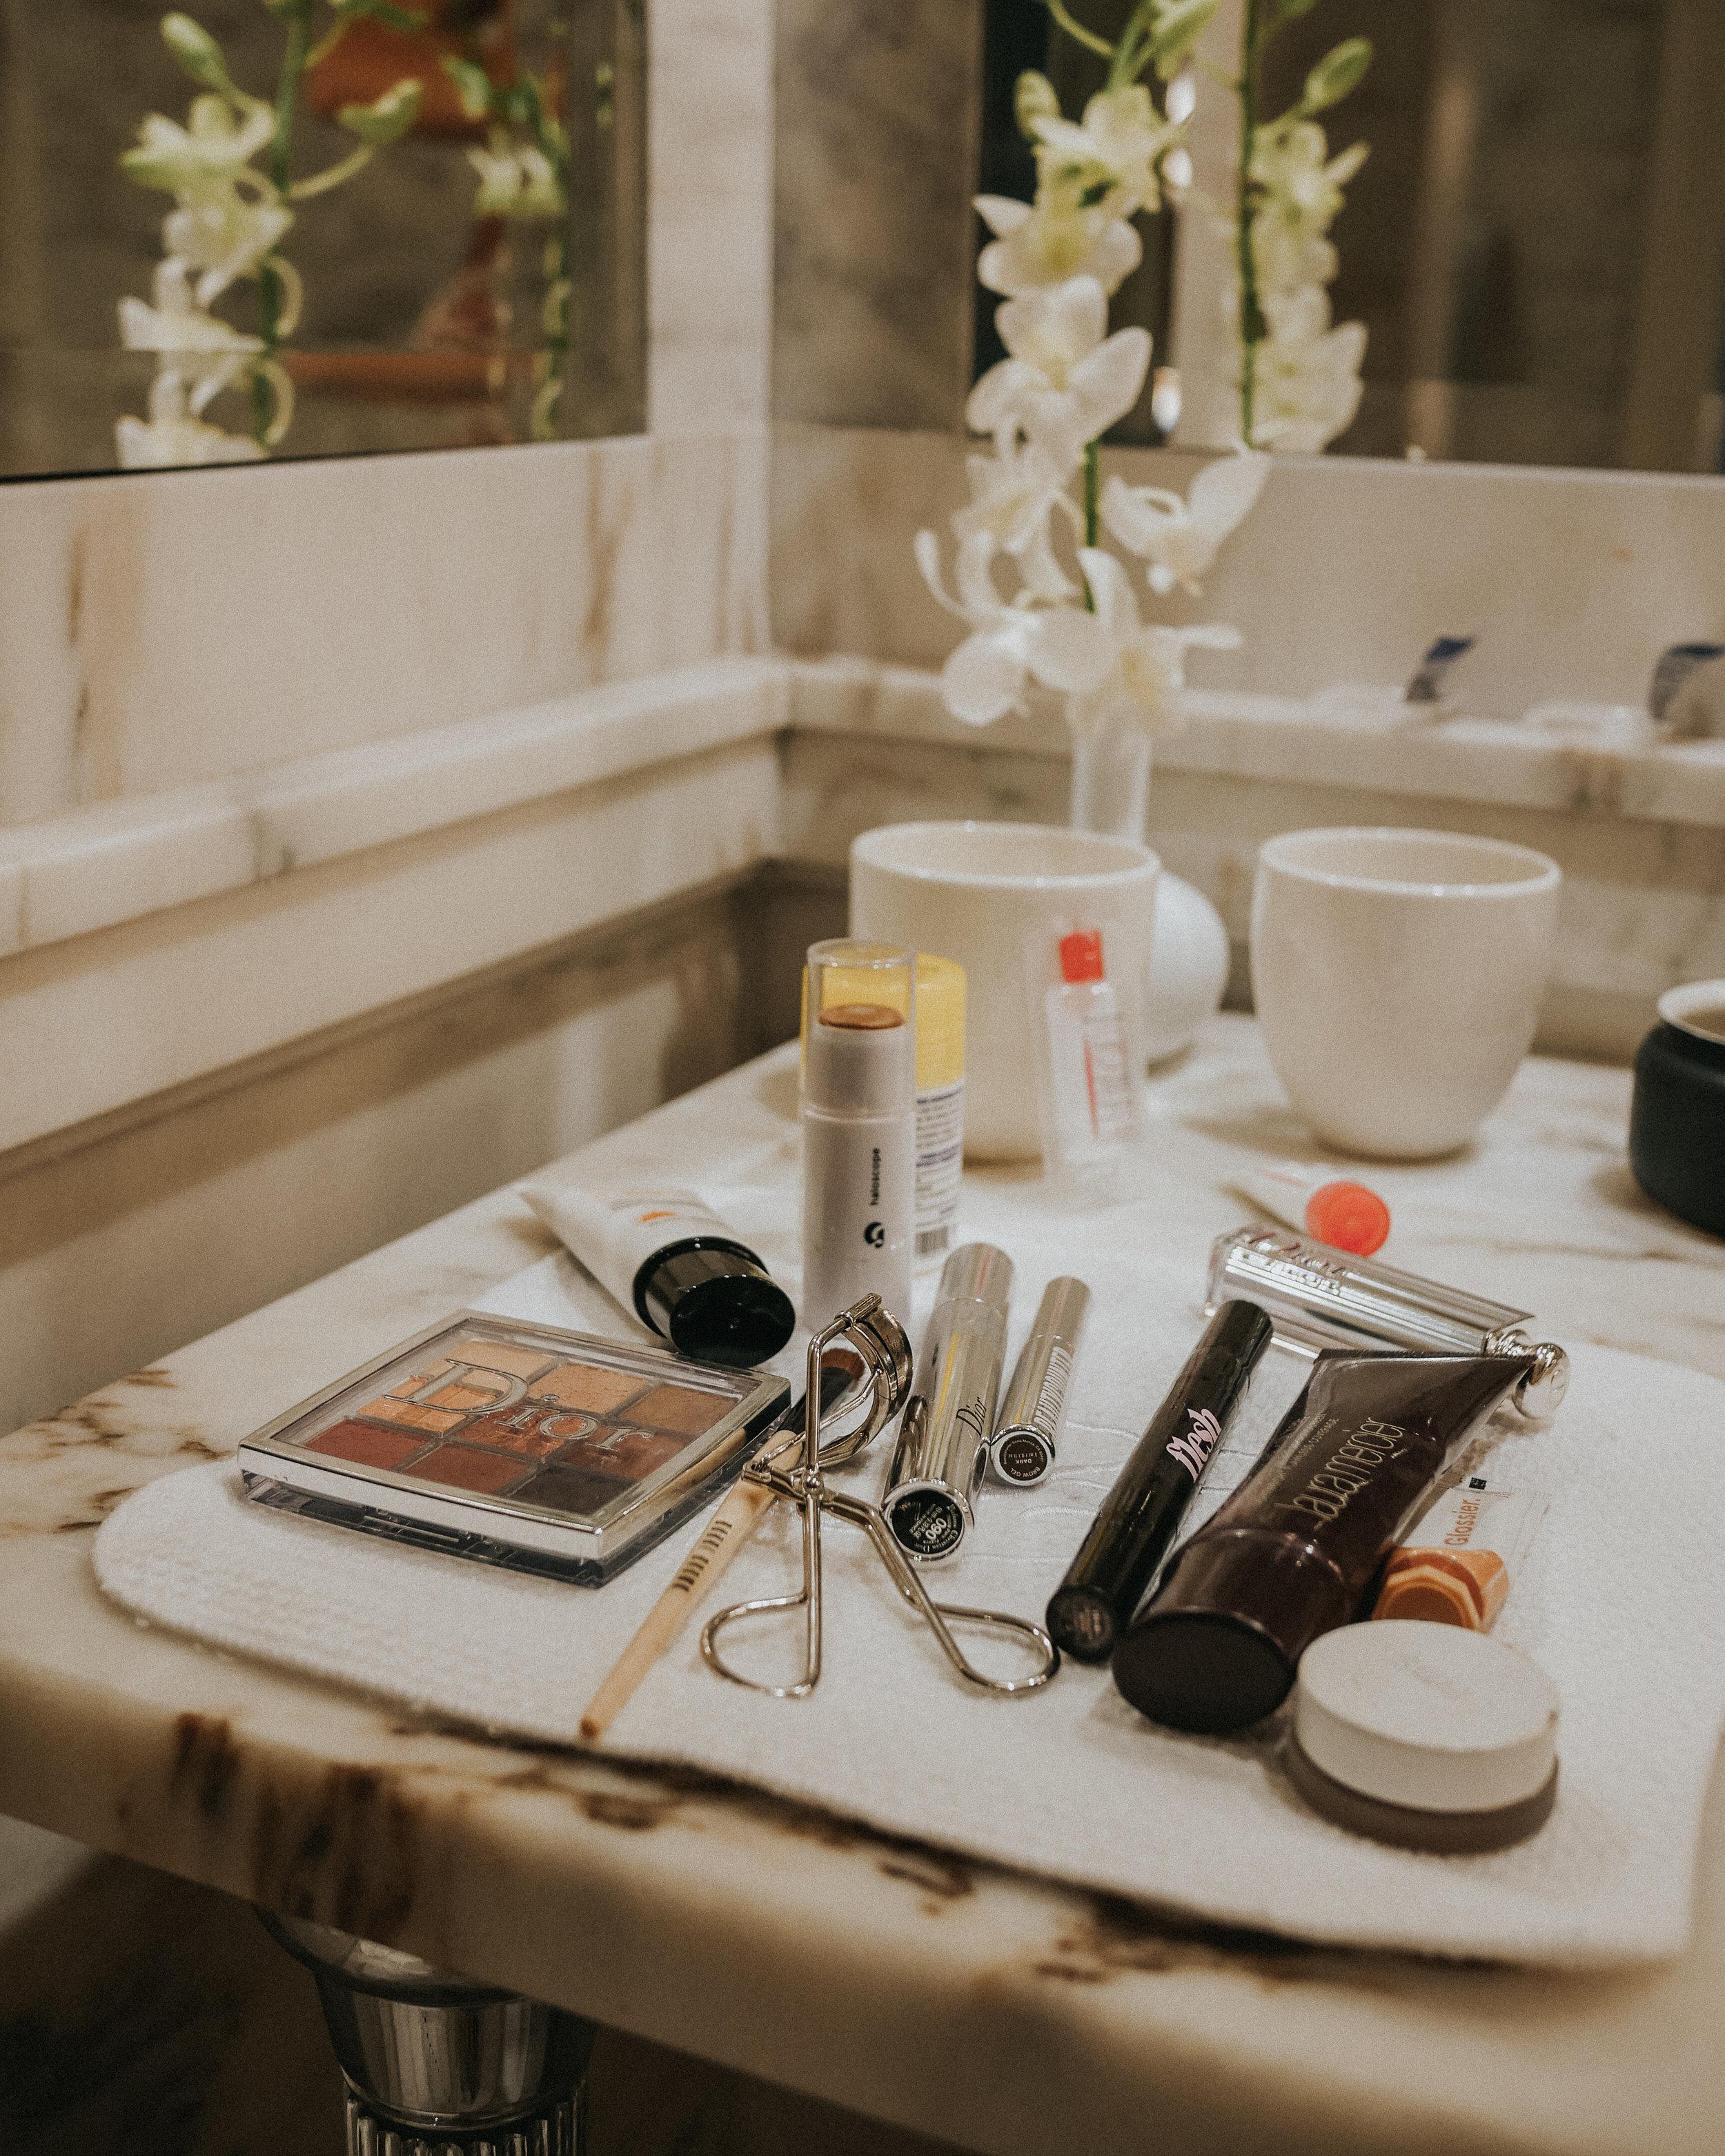 Essentials only!  Dior Backstage Eyeshadow Palette, Belif Sunscreen, Glossier Haloscope, Flesh concealer, Laura Mercier Tinted Moisturizer, RMS Beauty Bronzer, Dior Snow Lipstick, Glossier Cloud Paint in Haze.